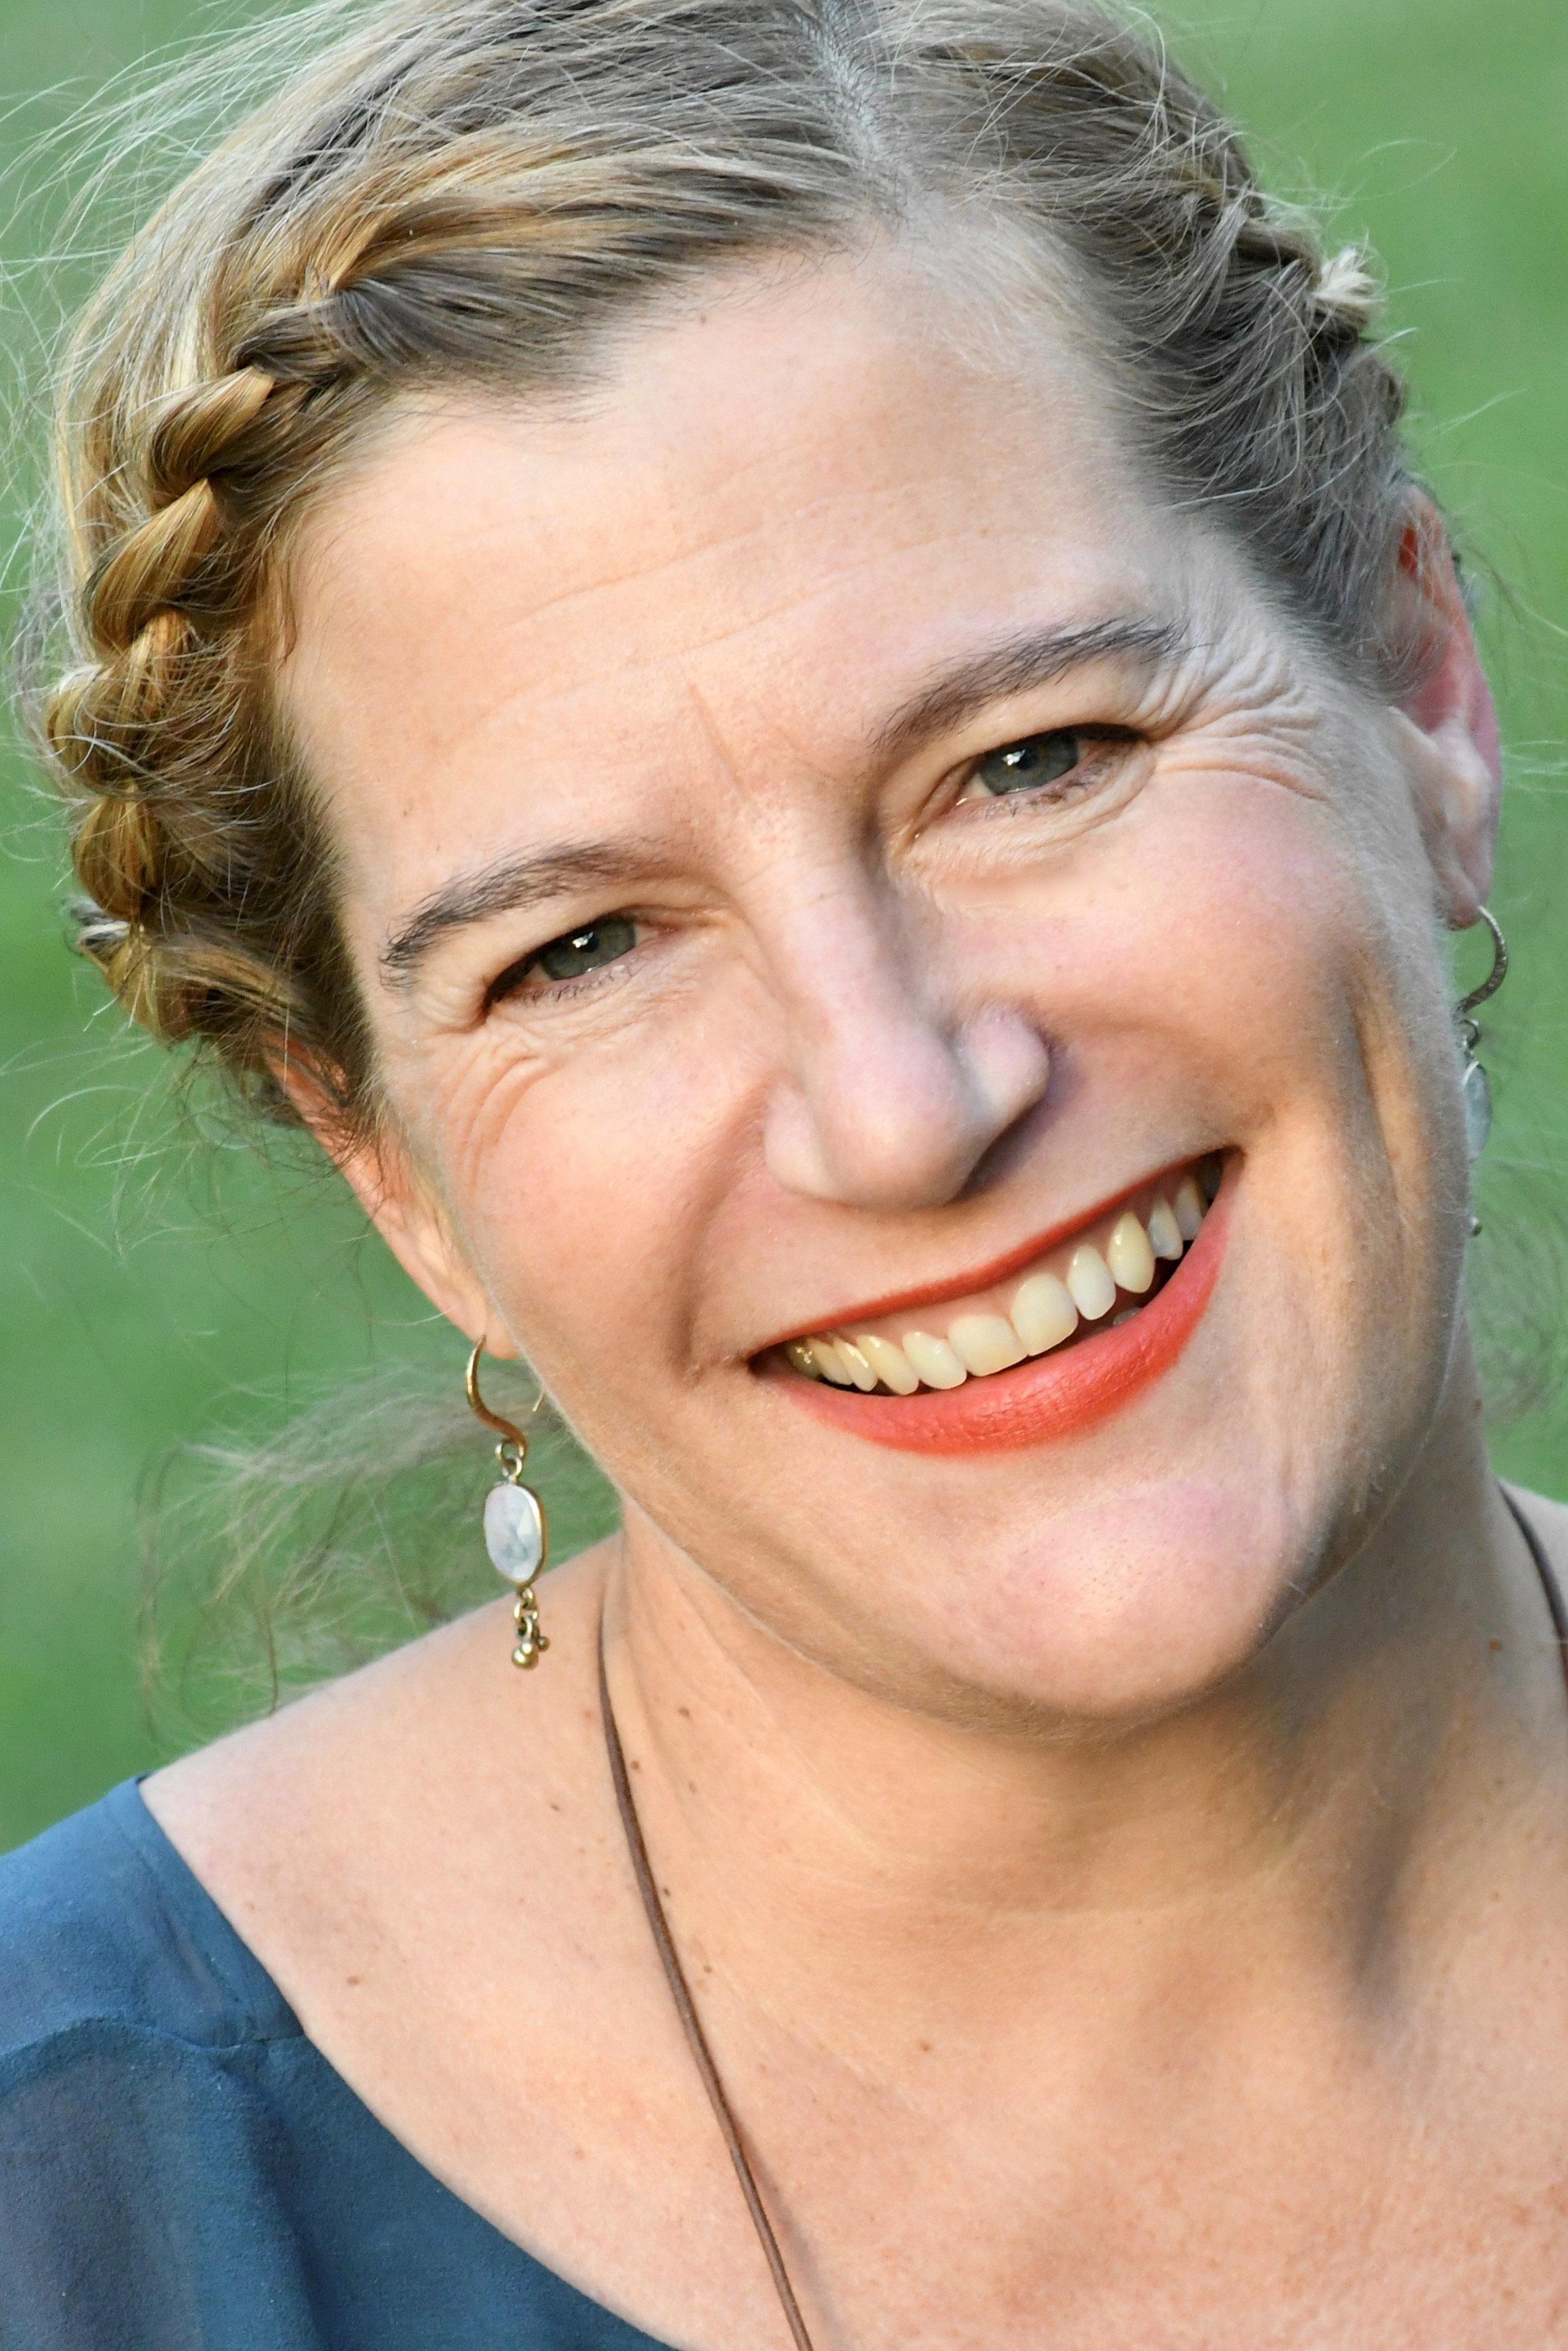 Author photo of Sophie Blackall